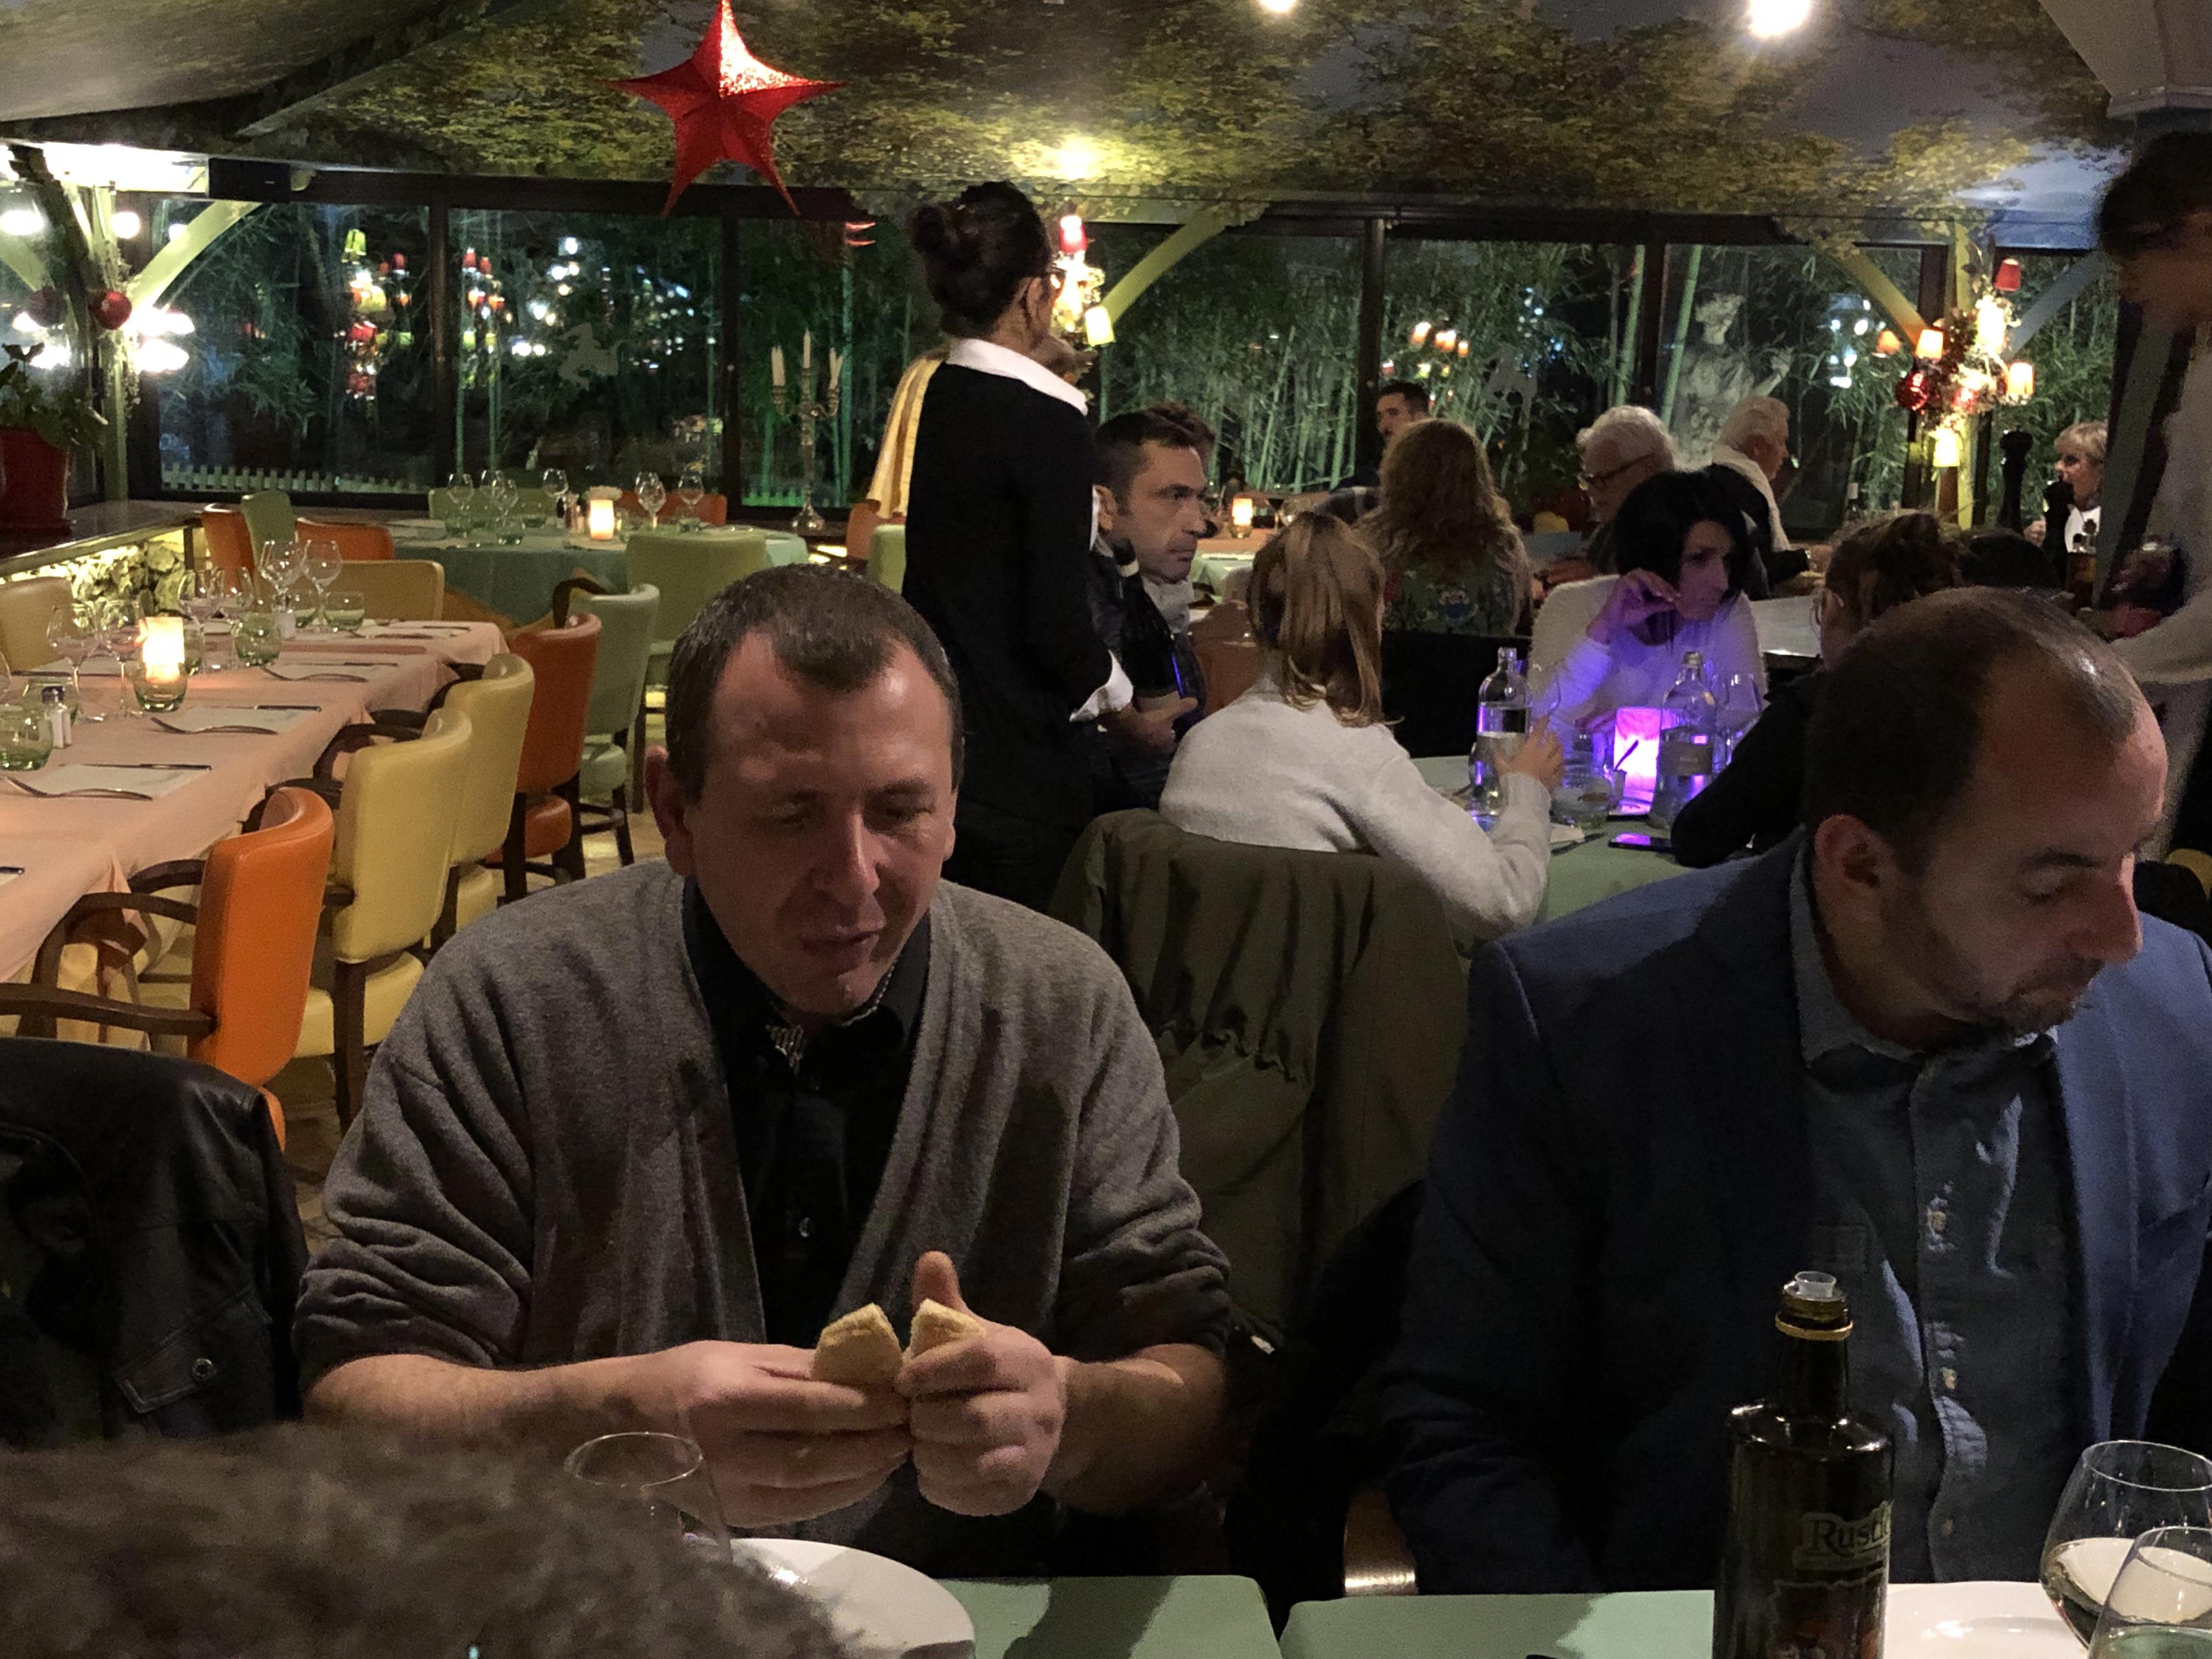 Repas-de-fin-d'année-marseille-paris-nice-noel-audiovisuel-event-evenement-evenementiel-communication-equipe-team-aucop